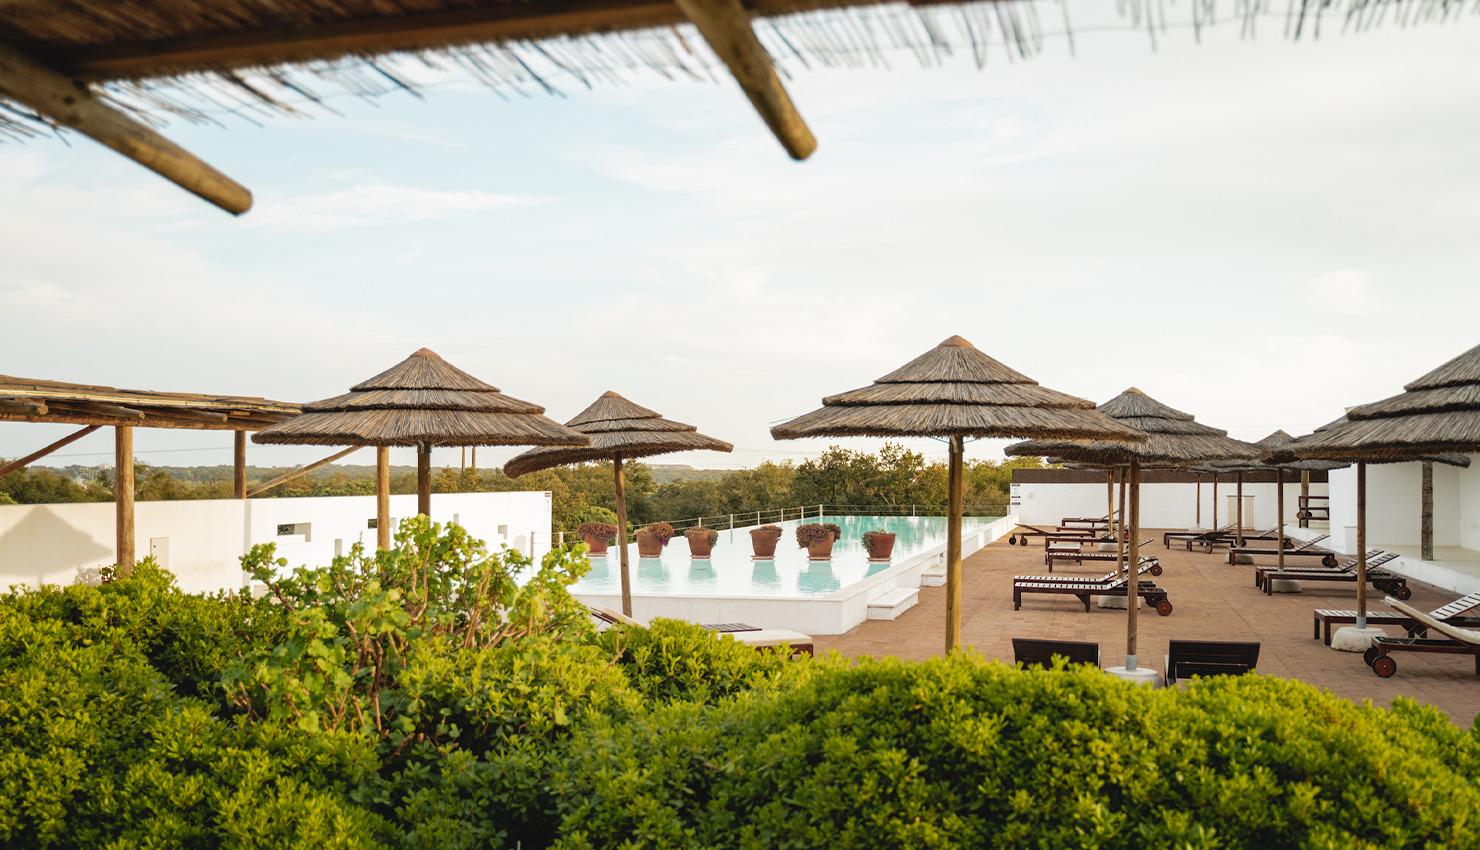 portugal-hoteles-sostenibles-bienestar-lujo-magazinehorse